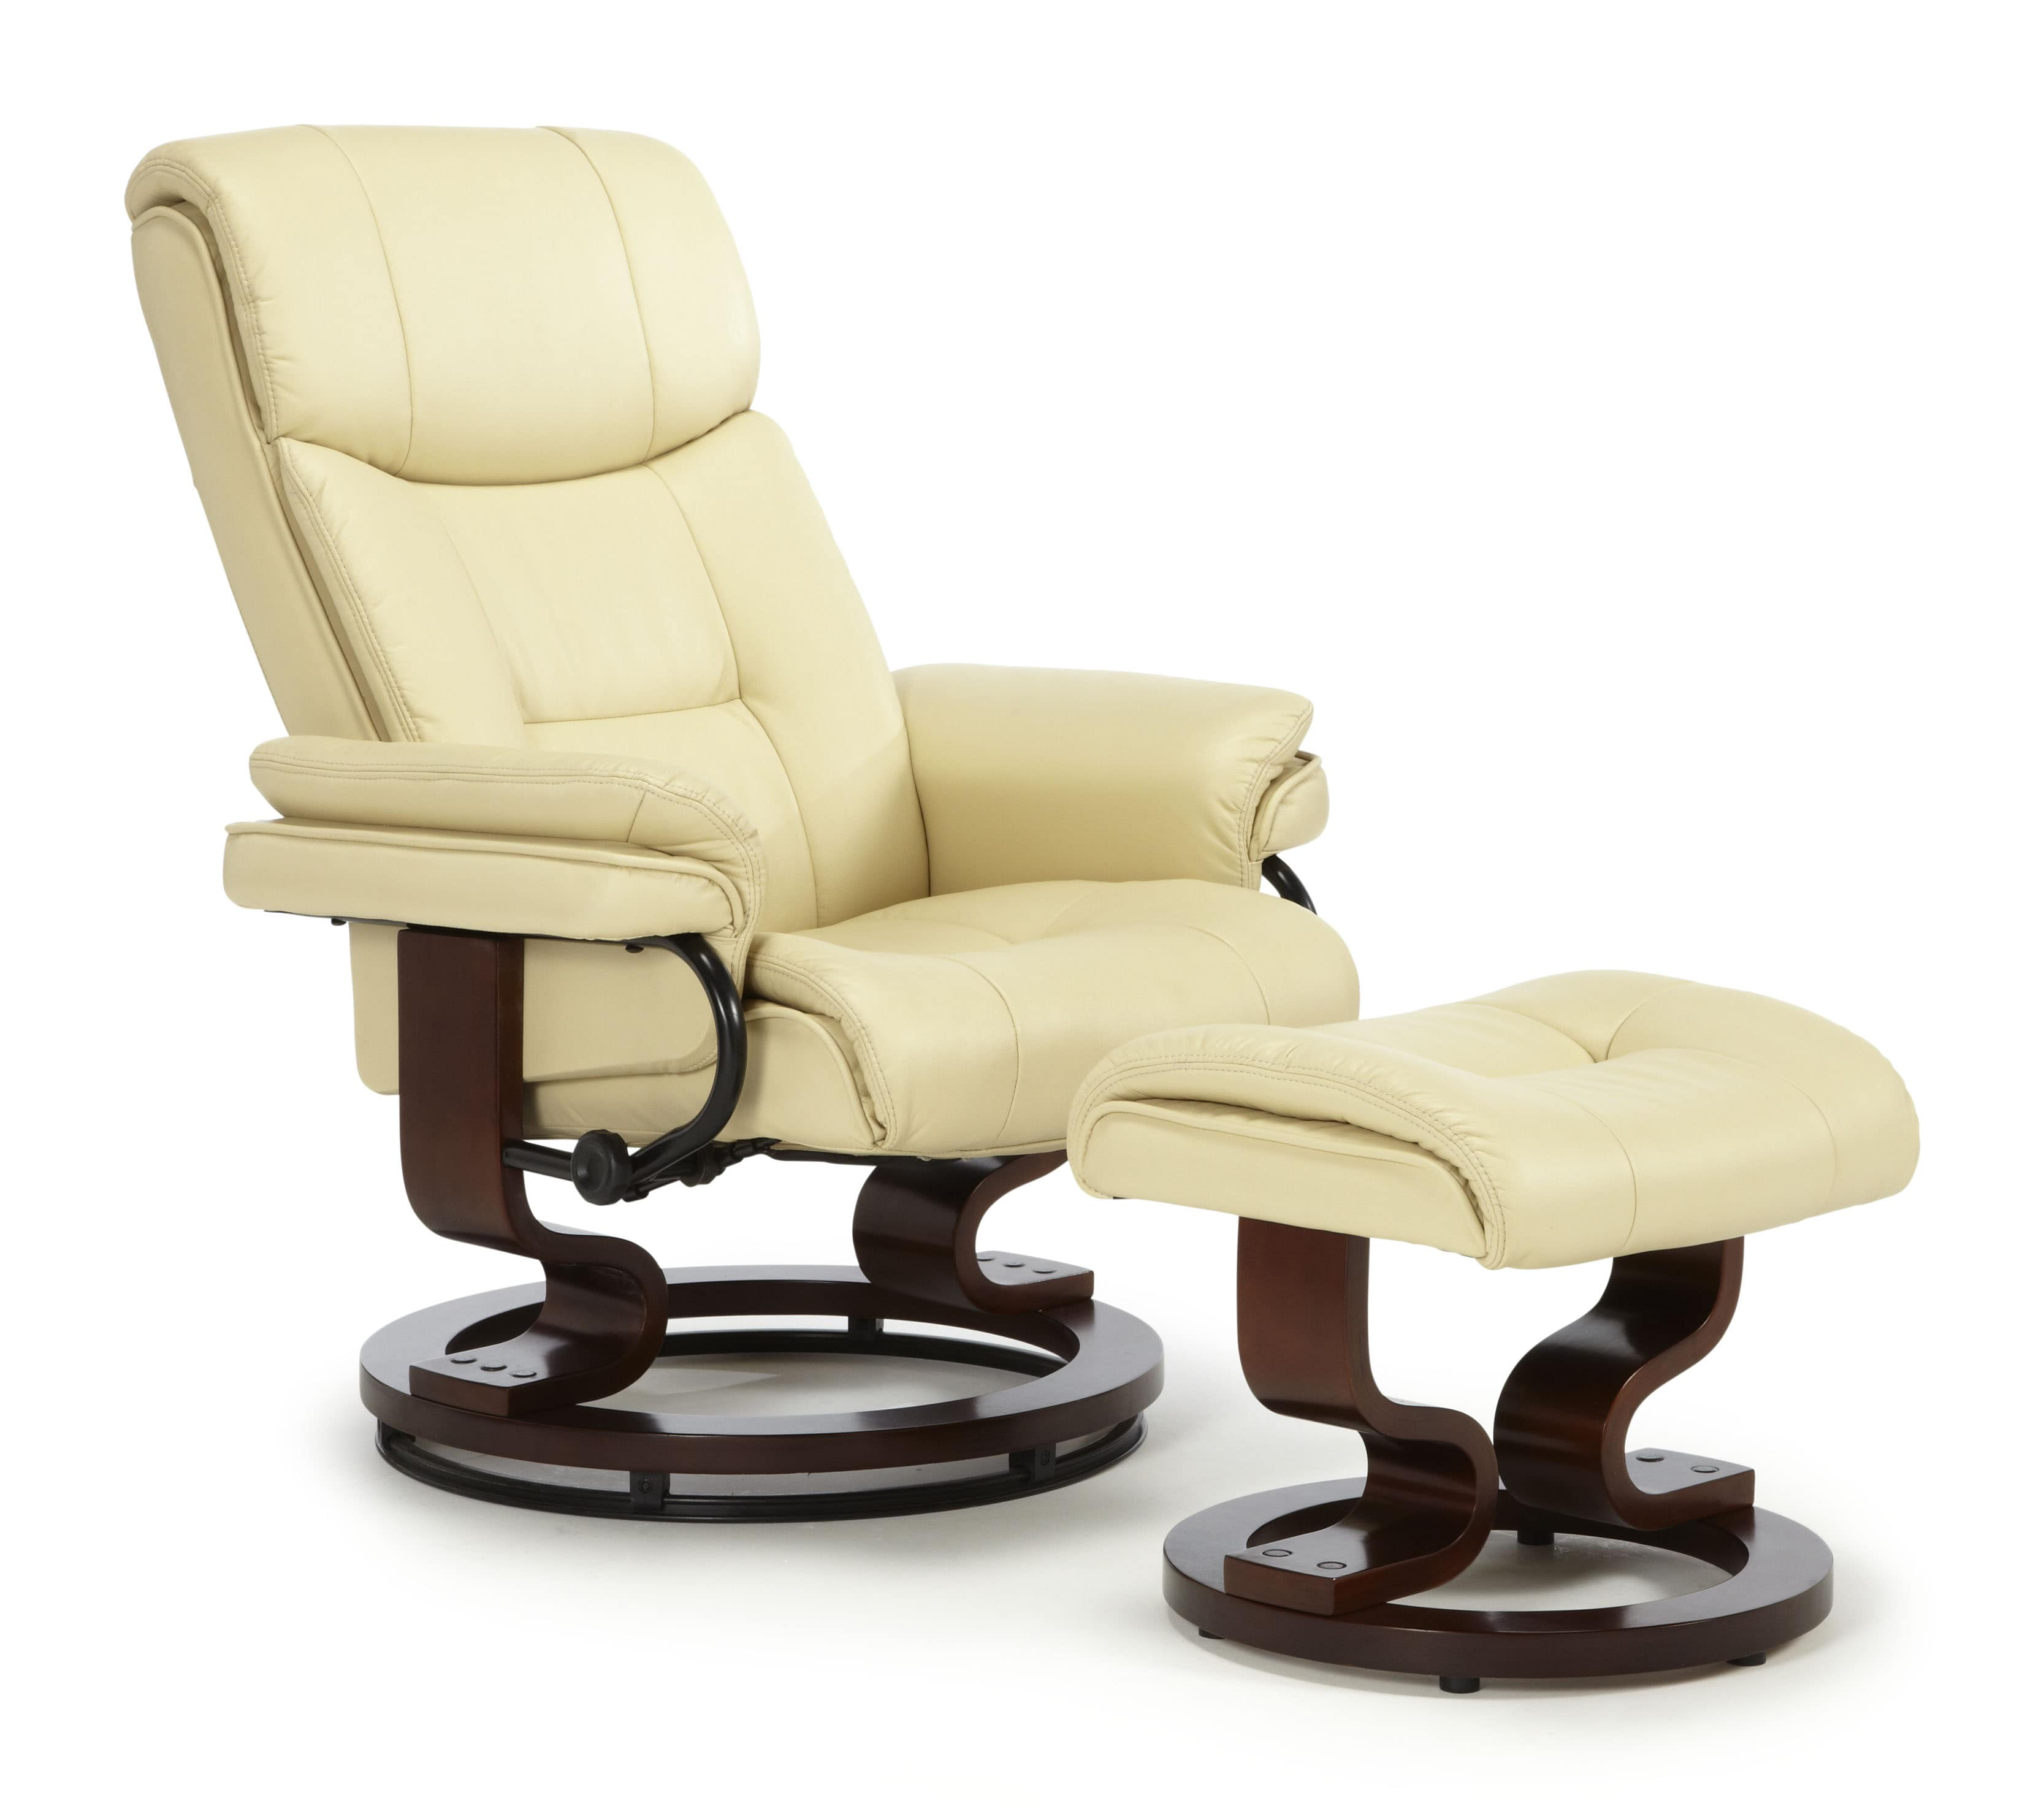 Moss Swivel Chair Cream PU Mahogany A min